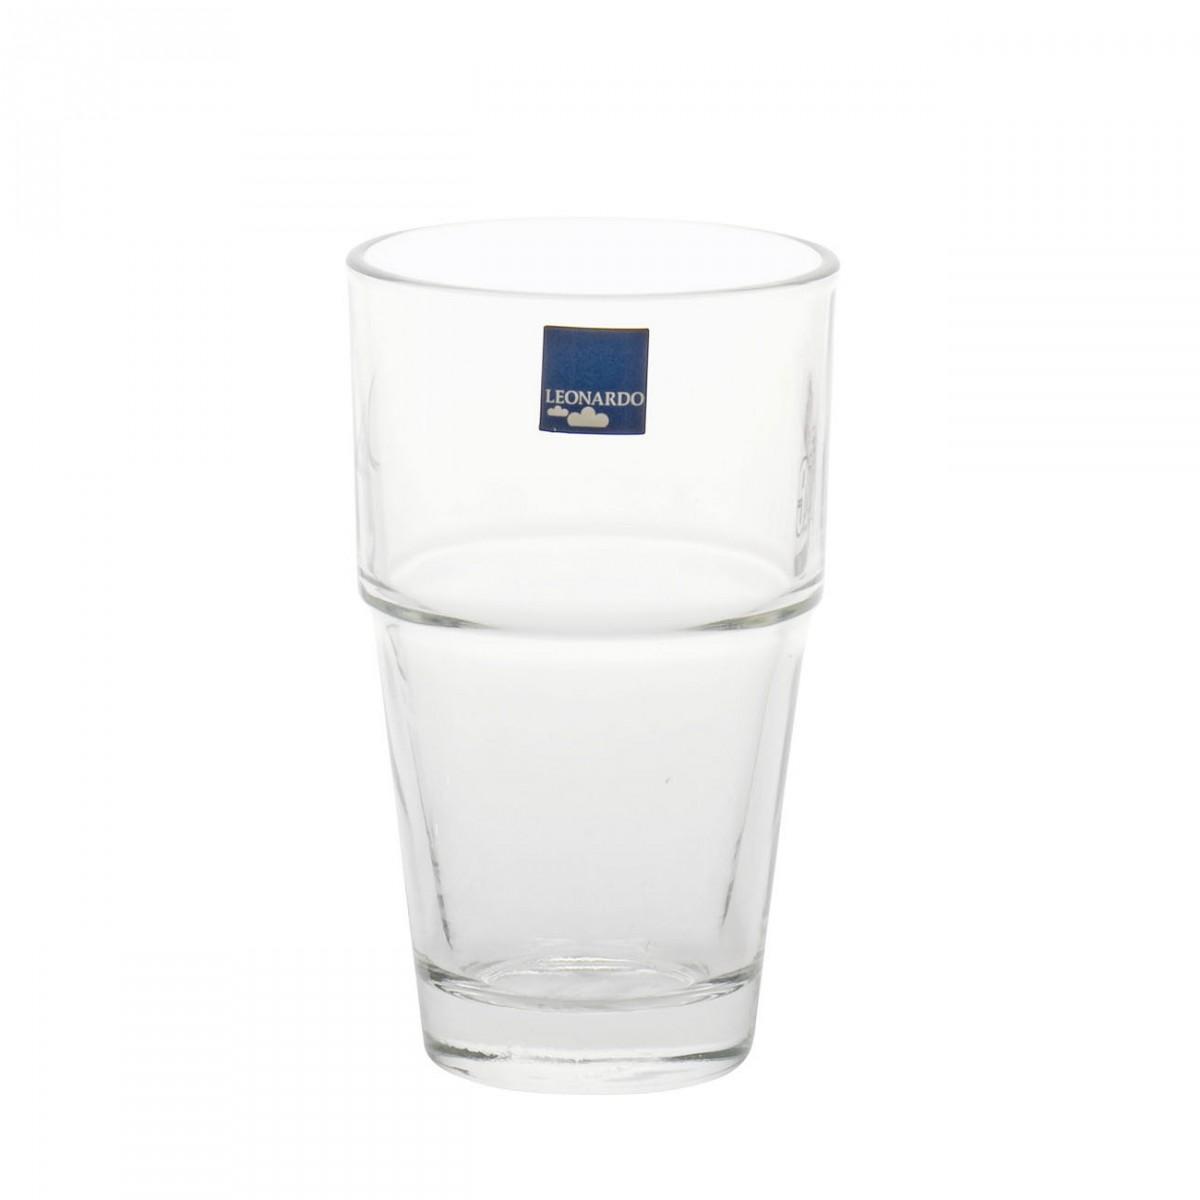 leonardo 043400 latte macchiato wasser becher solo glas 400ml h 14cm transparent 1 st ck. Black Bedroom Furniture Sets. Home Design Ideas